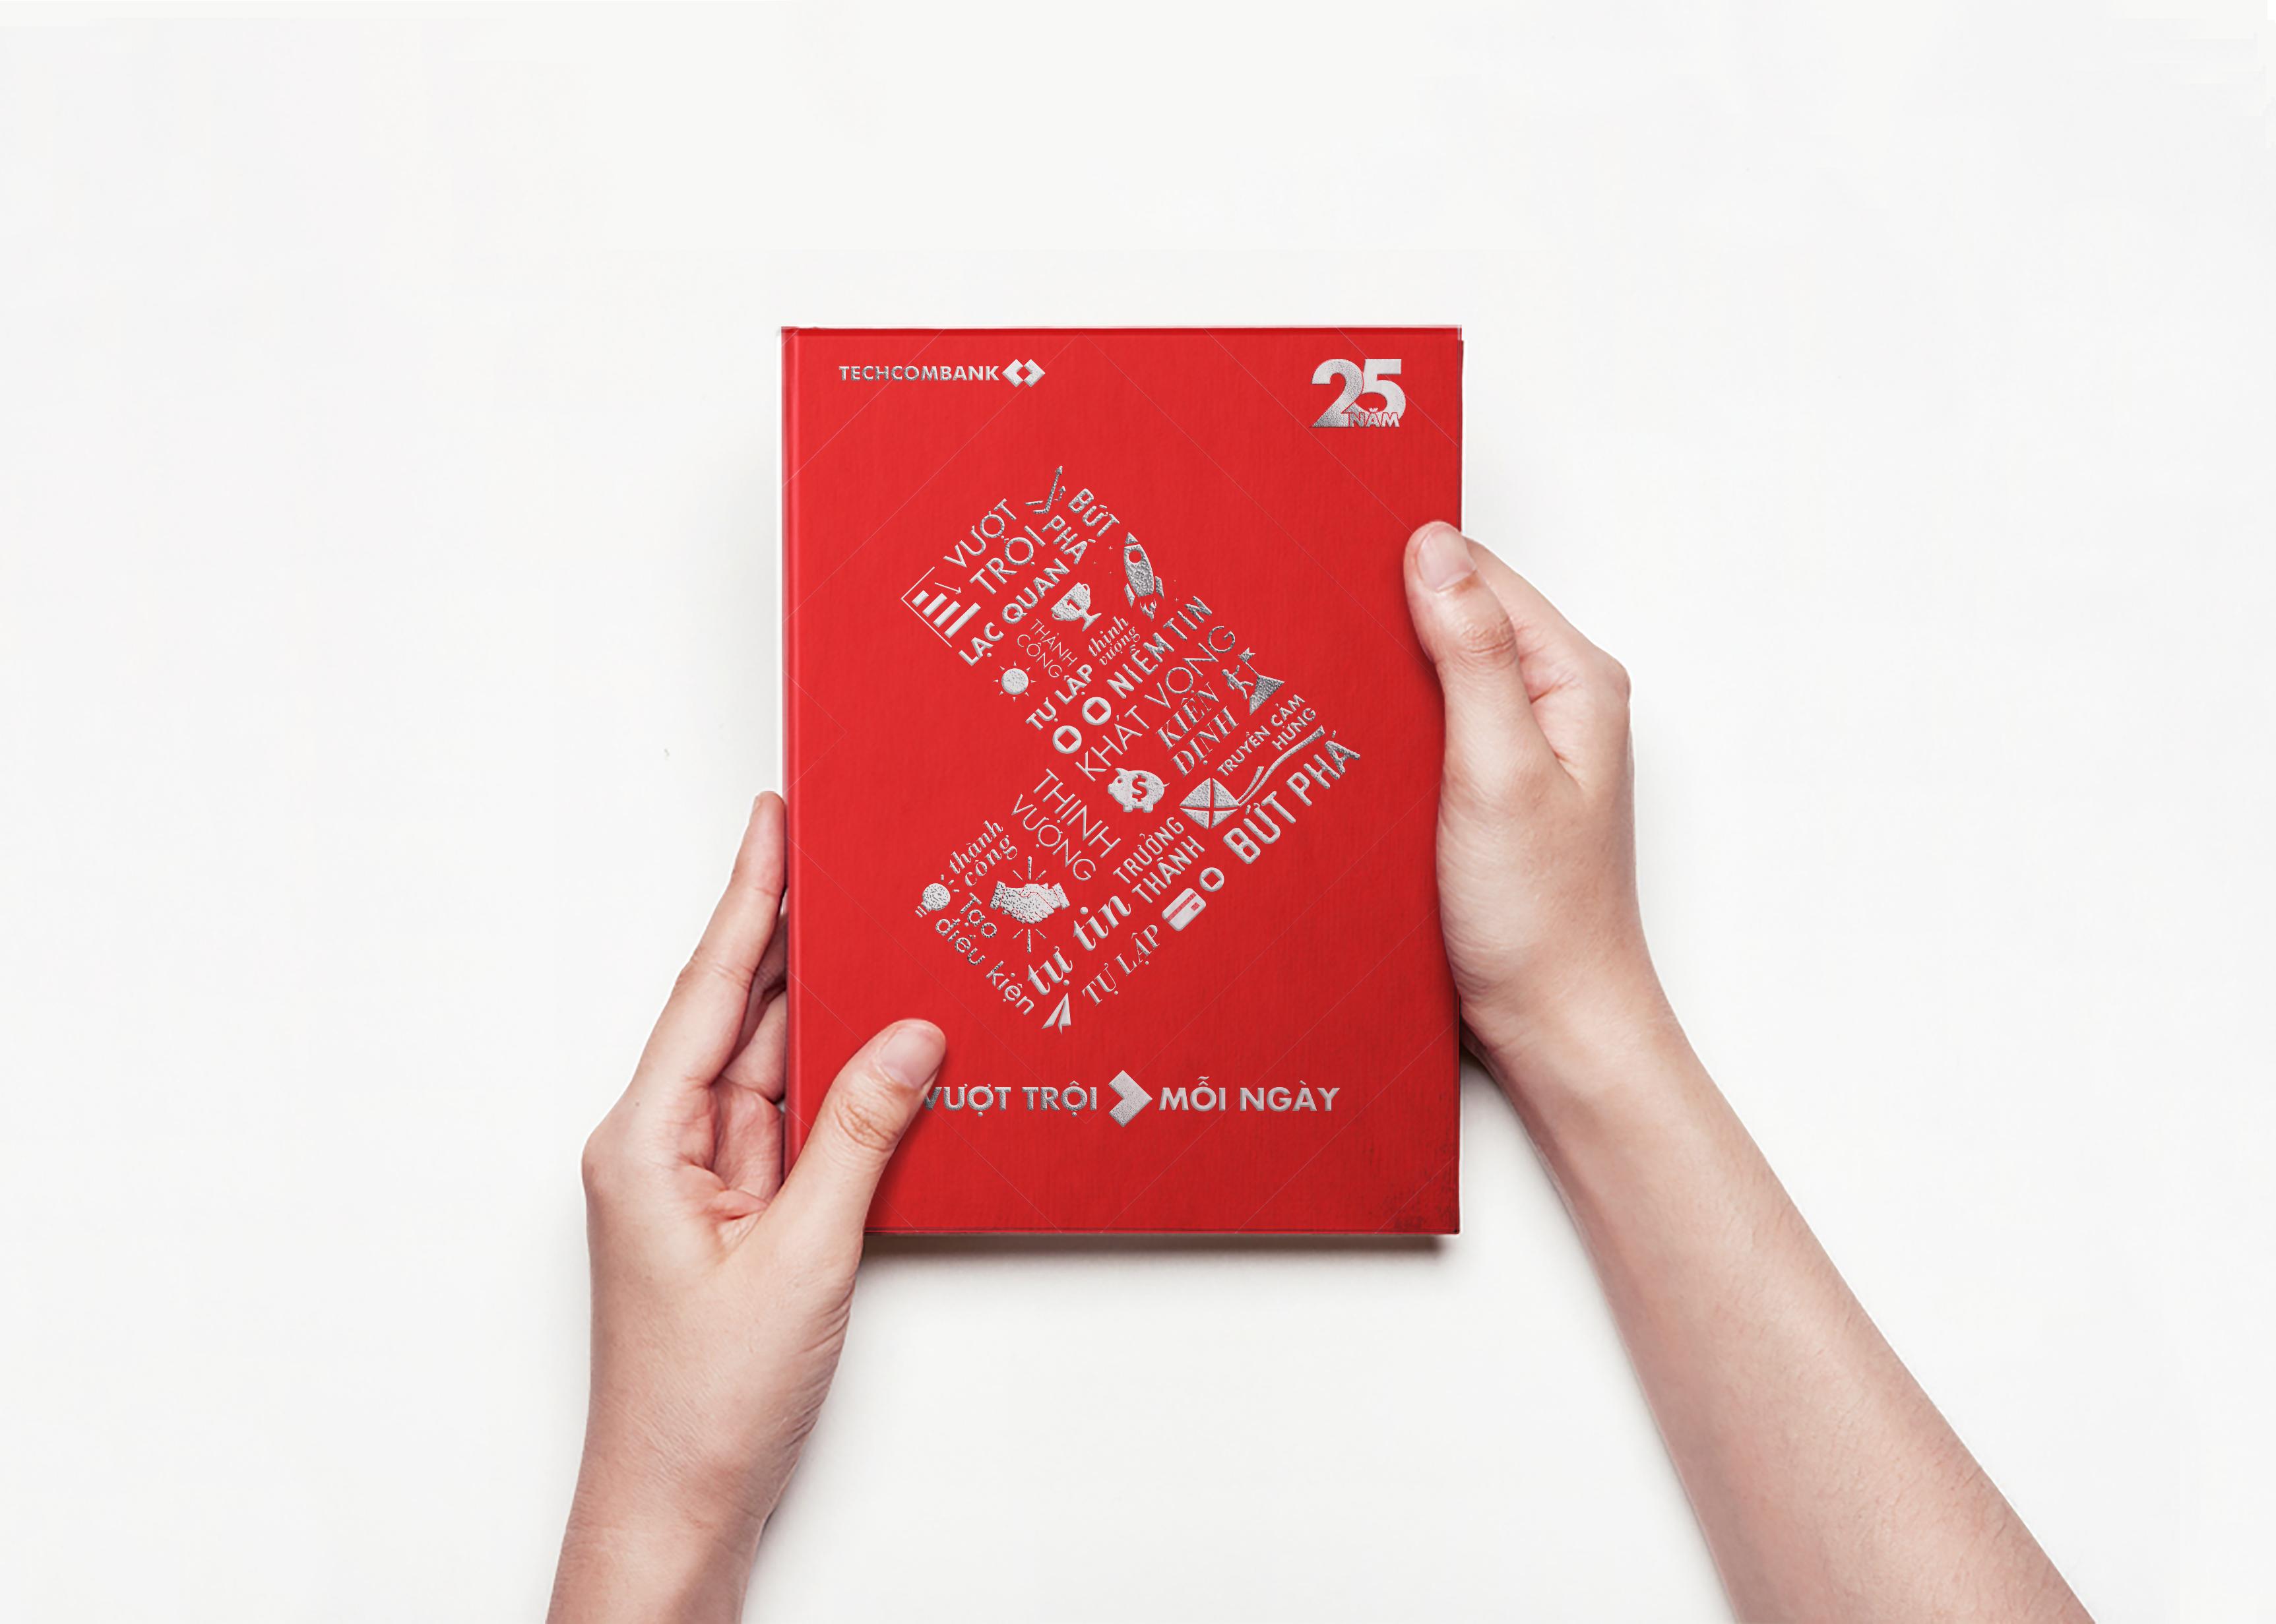 Techcombank - Sổ tay nhân viên - BOND